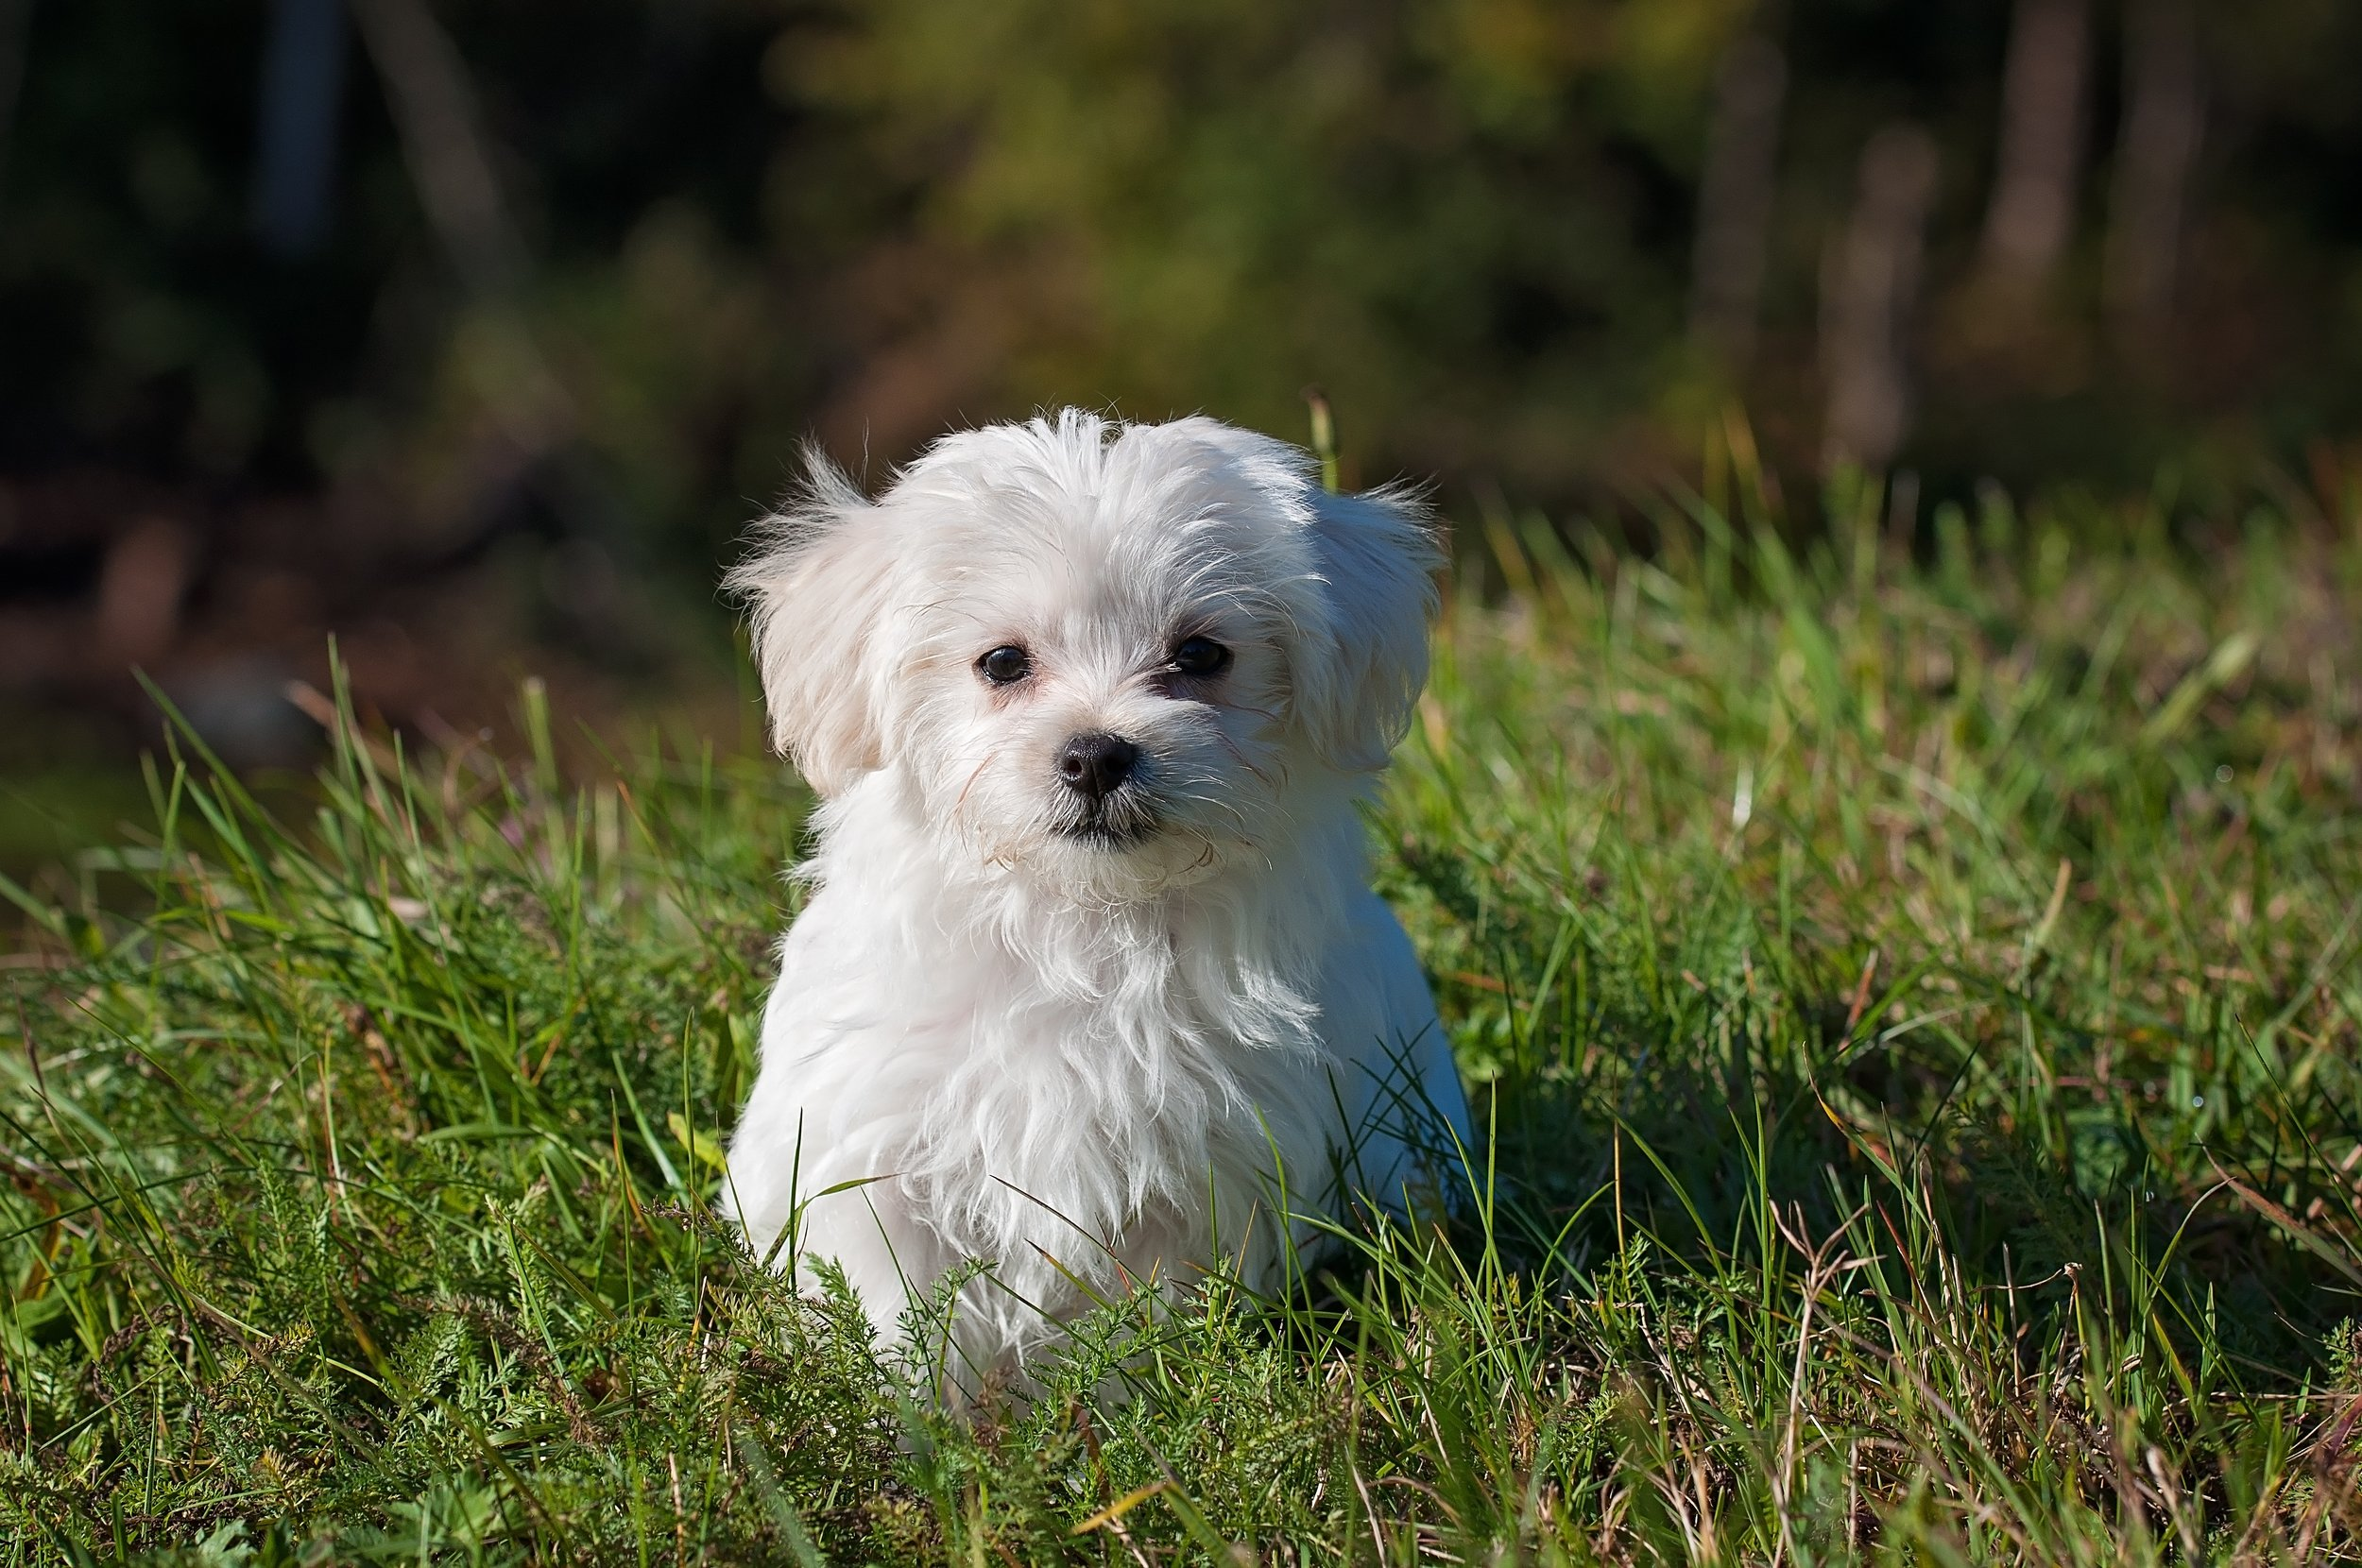 nature-white-meadow-puppy-dog-animal-666813-pxhere.com.jpg